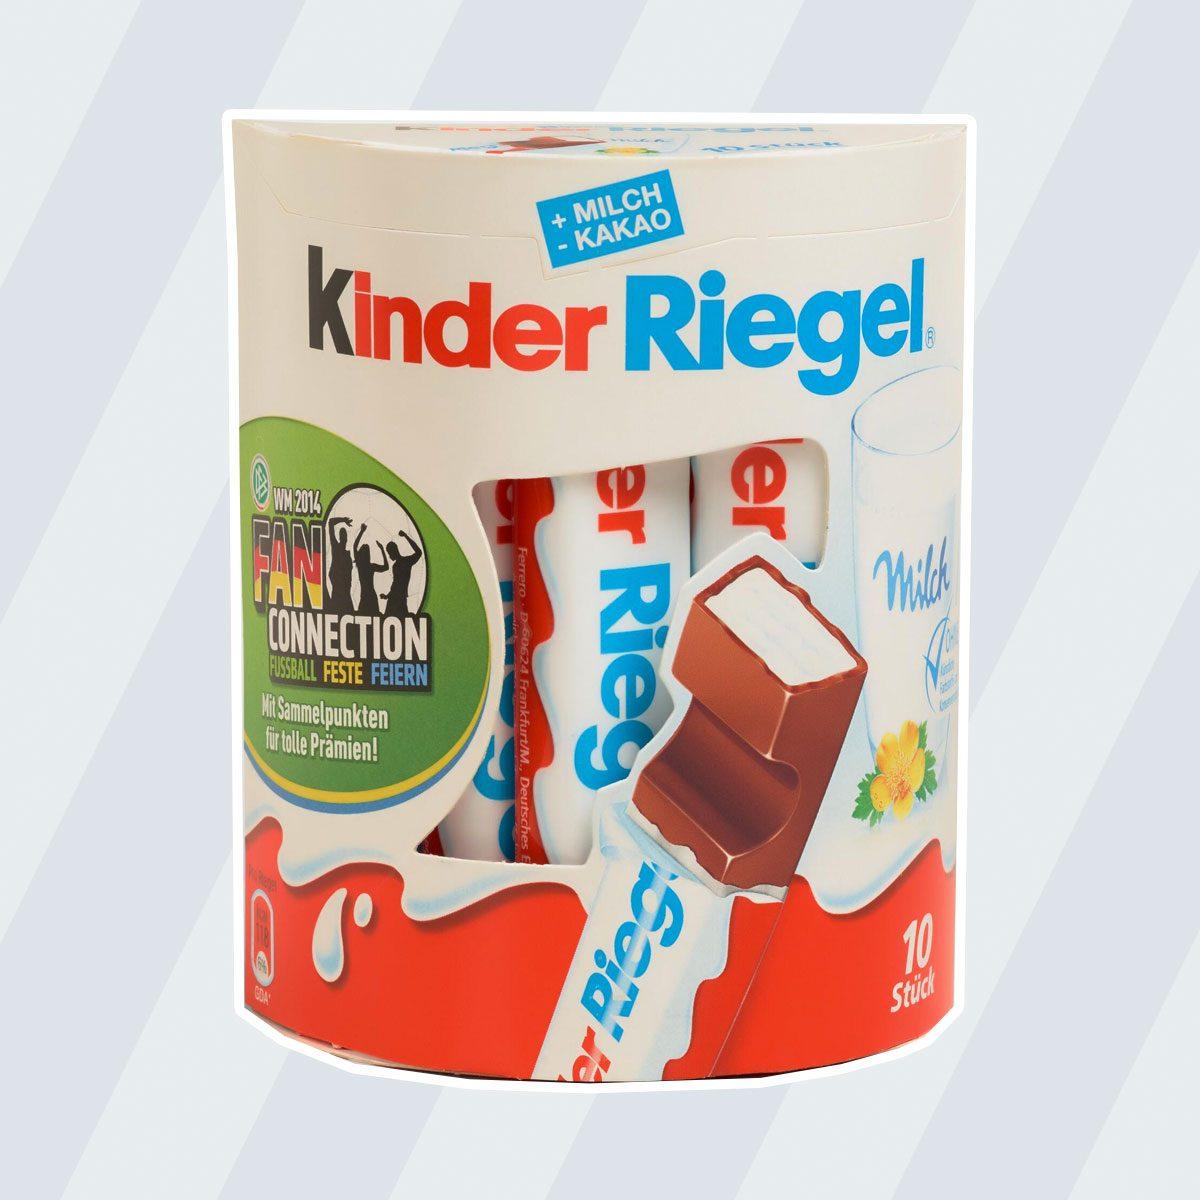 Kinder Riegel Milk Chocolate Sticks